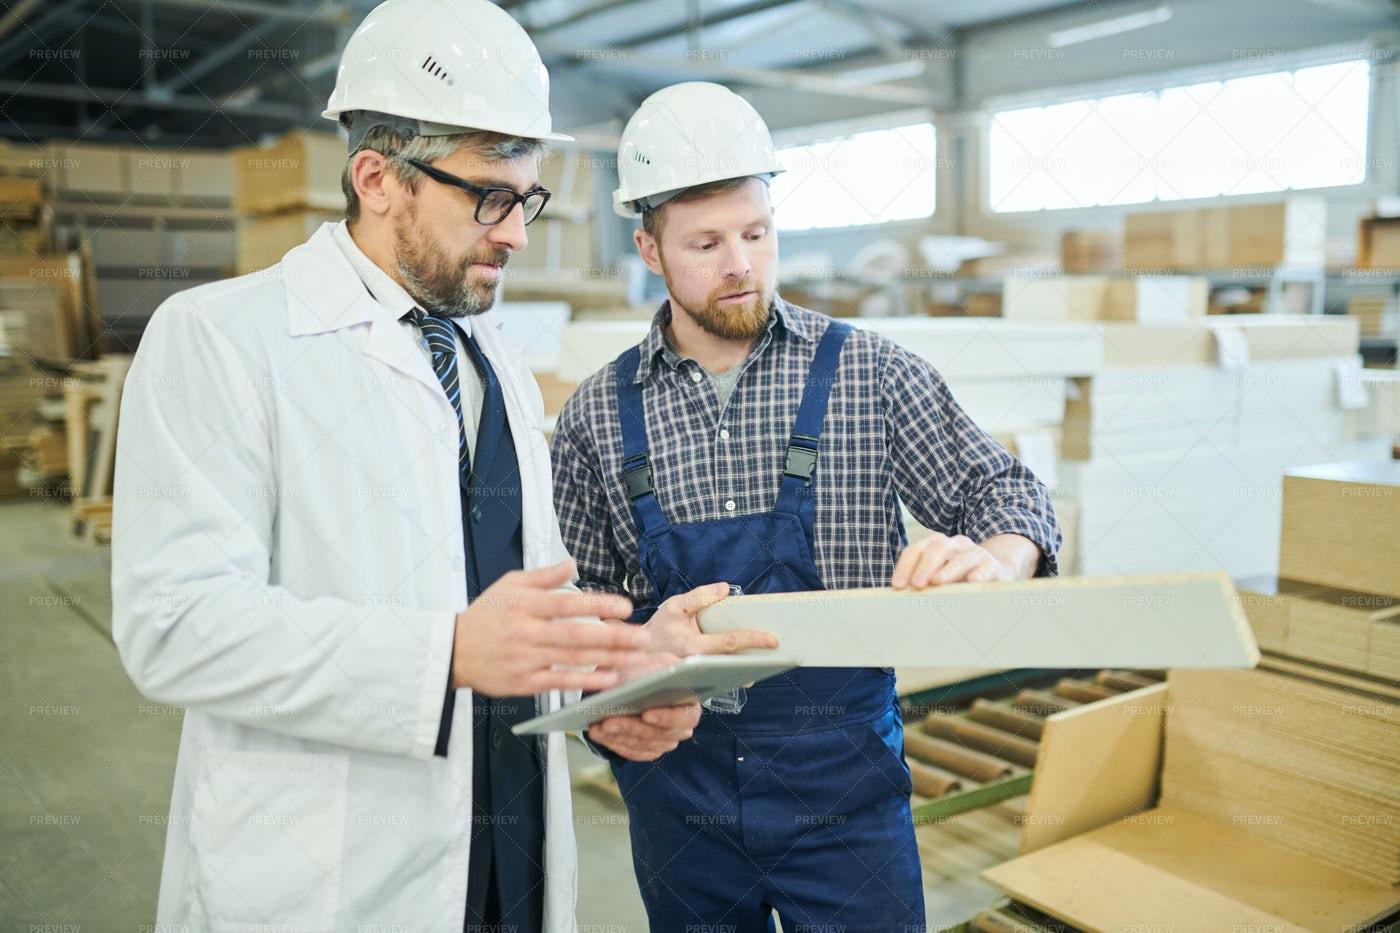 Quality Control Expert Examining...: Stock Photos